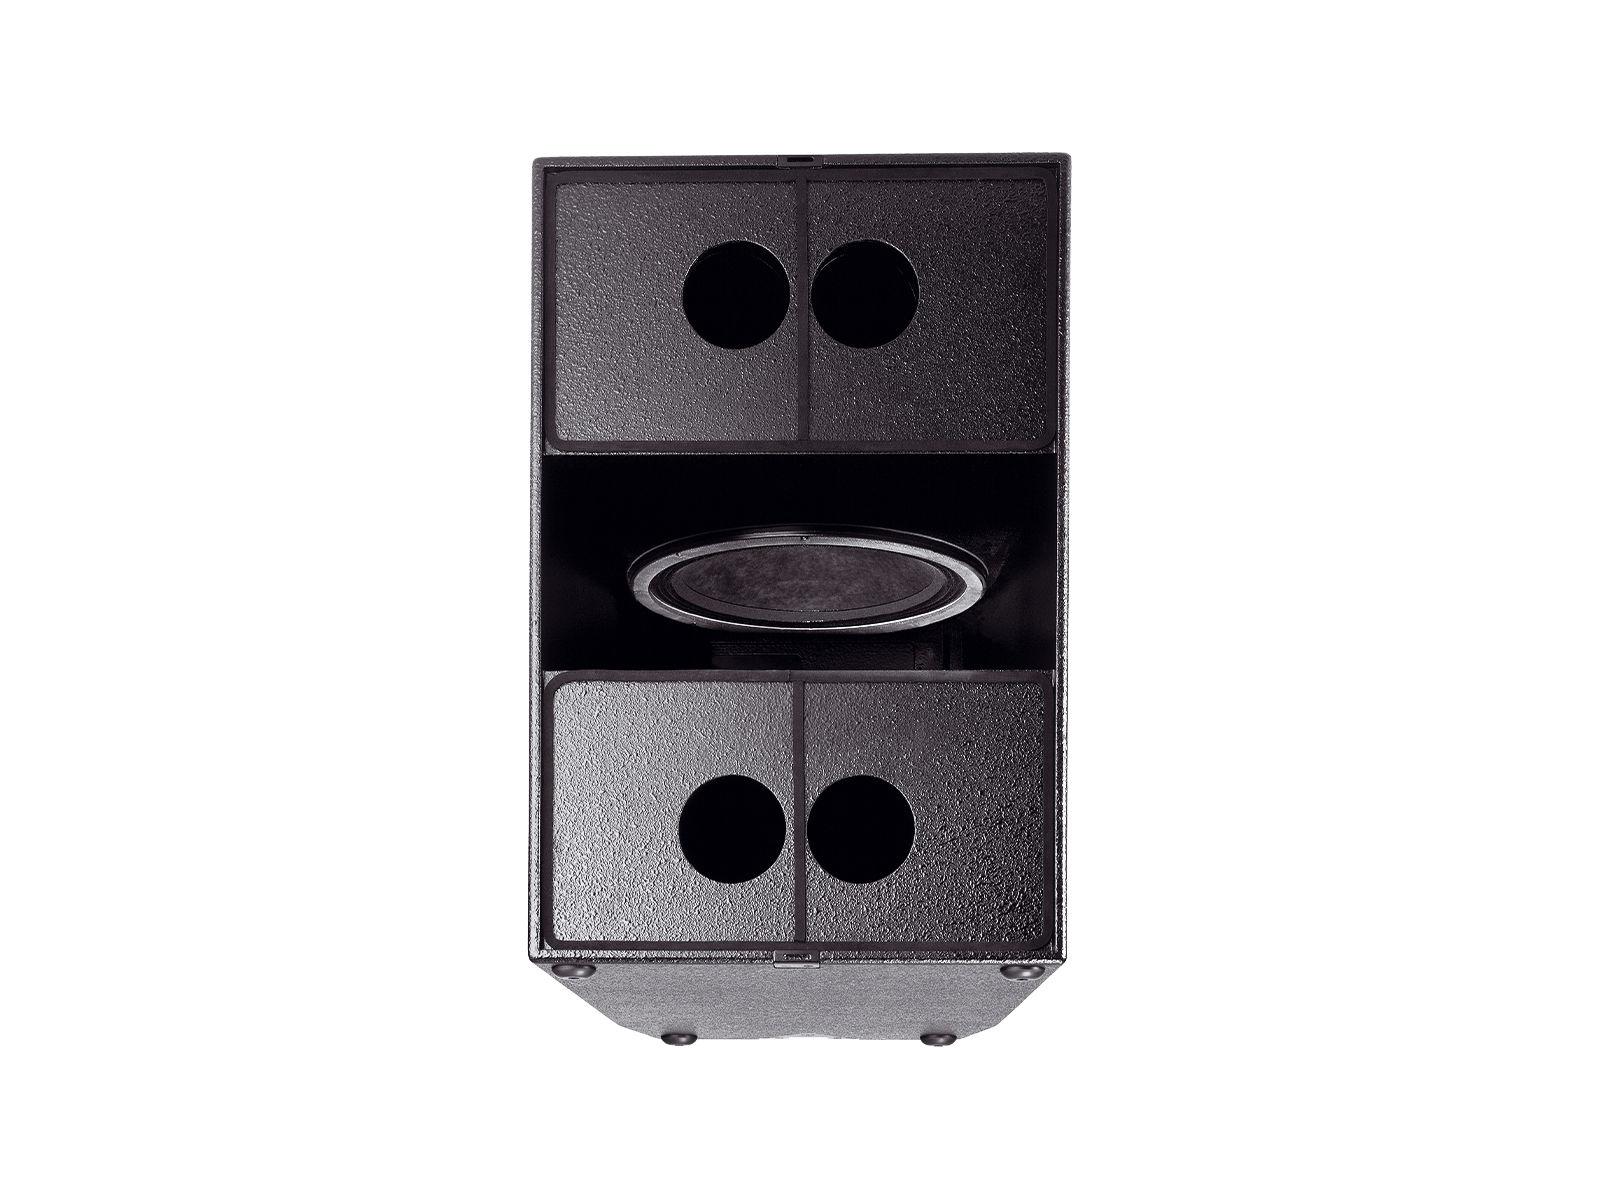 "Kling & Freitag ACCESS B5 Outdoor Mobile RAL | ACCESS B5 Bass, 2x18"", Outdoor Mobile, 2xSpeakOn NLT4MP, RAL Farbe"